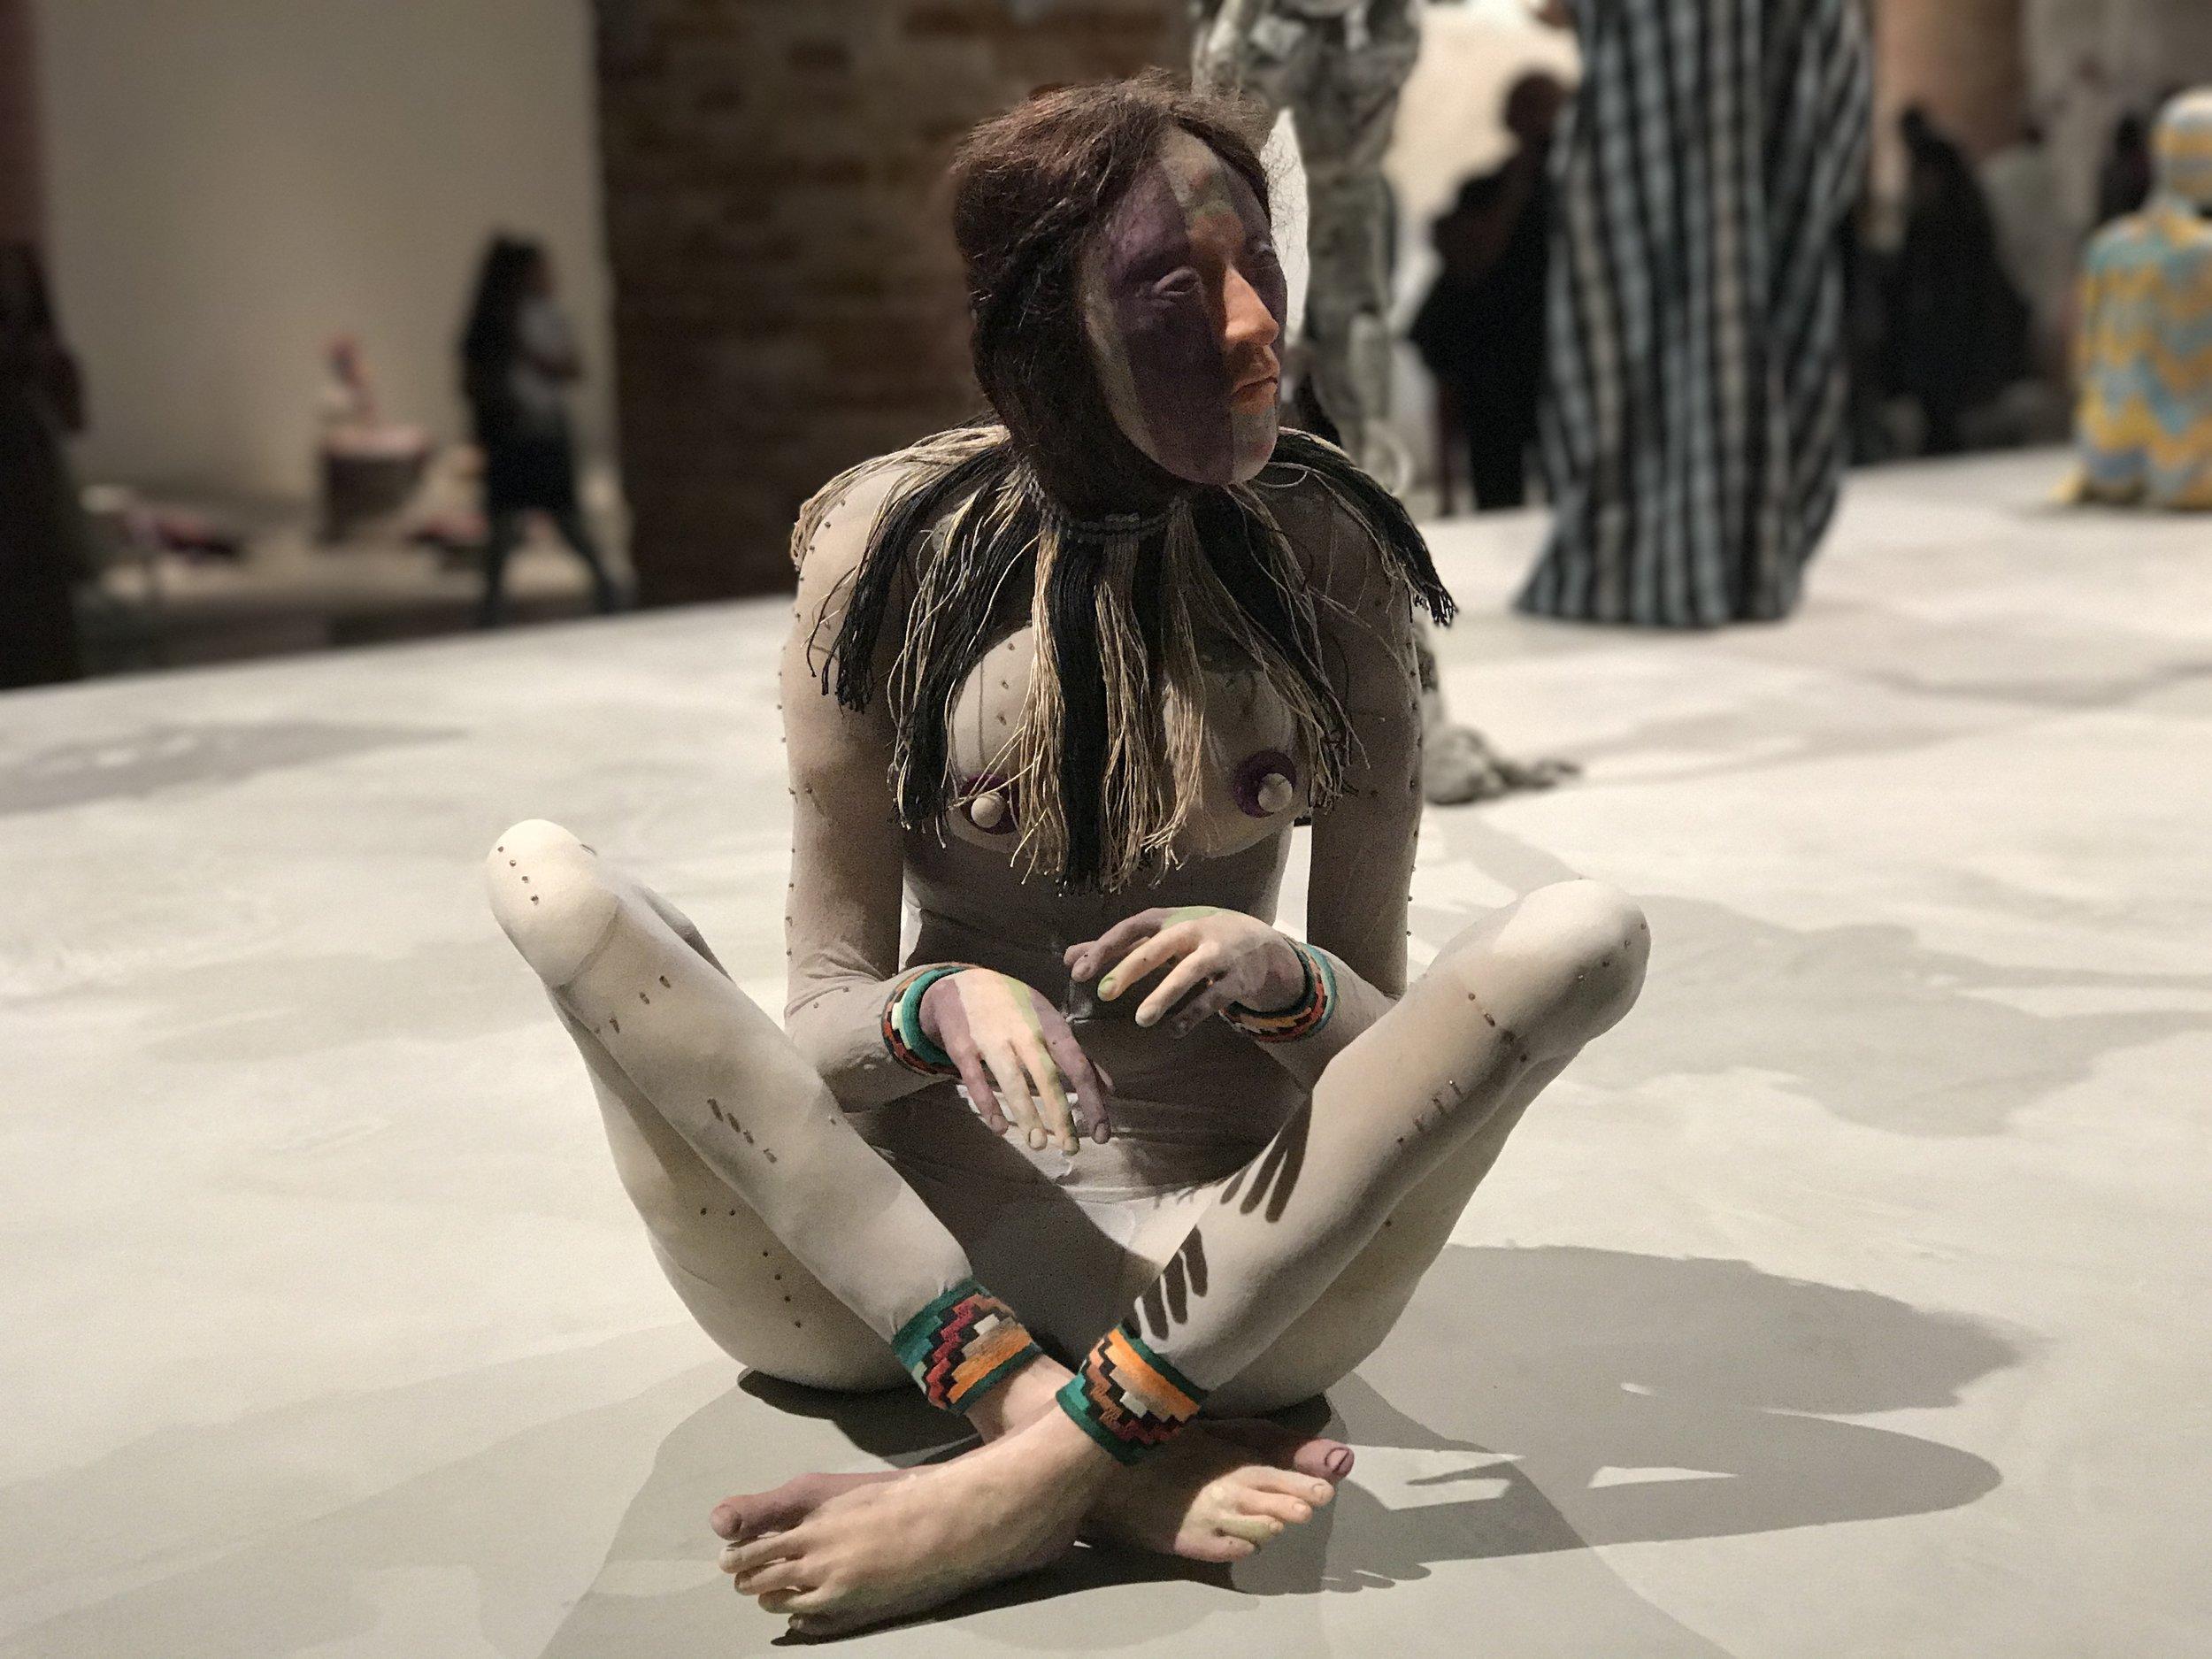 Francis_Upritchard_Biennale di Venezia_Sabina4.JPG